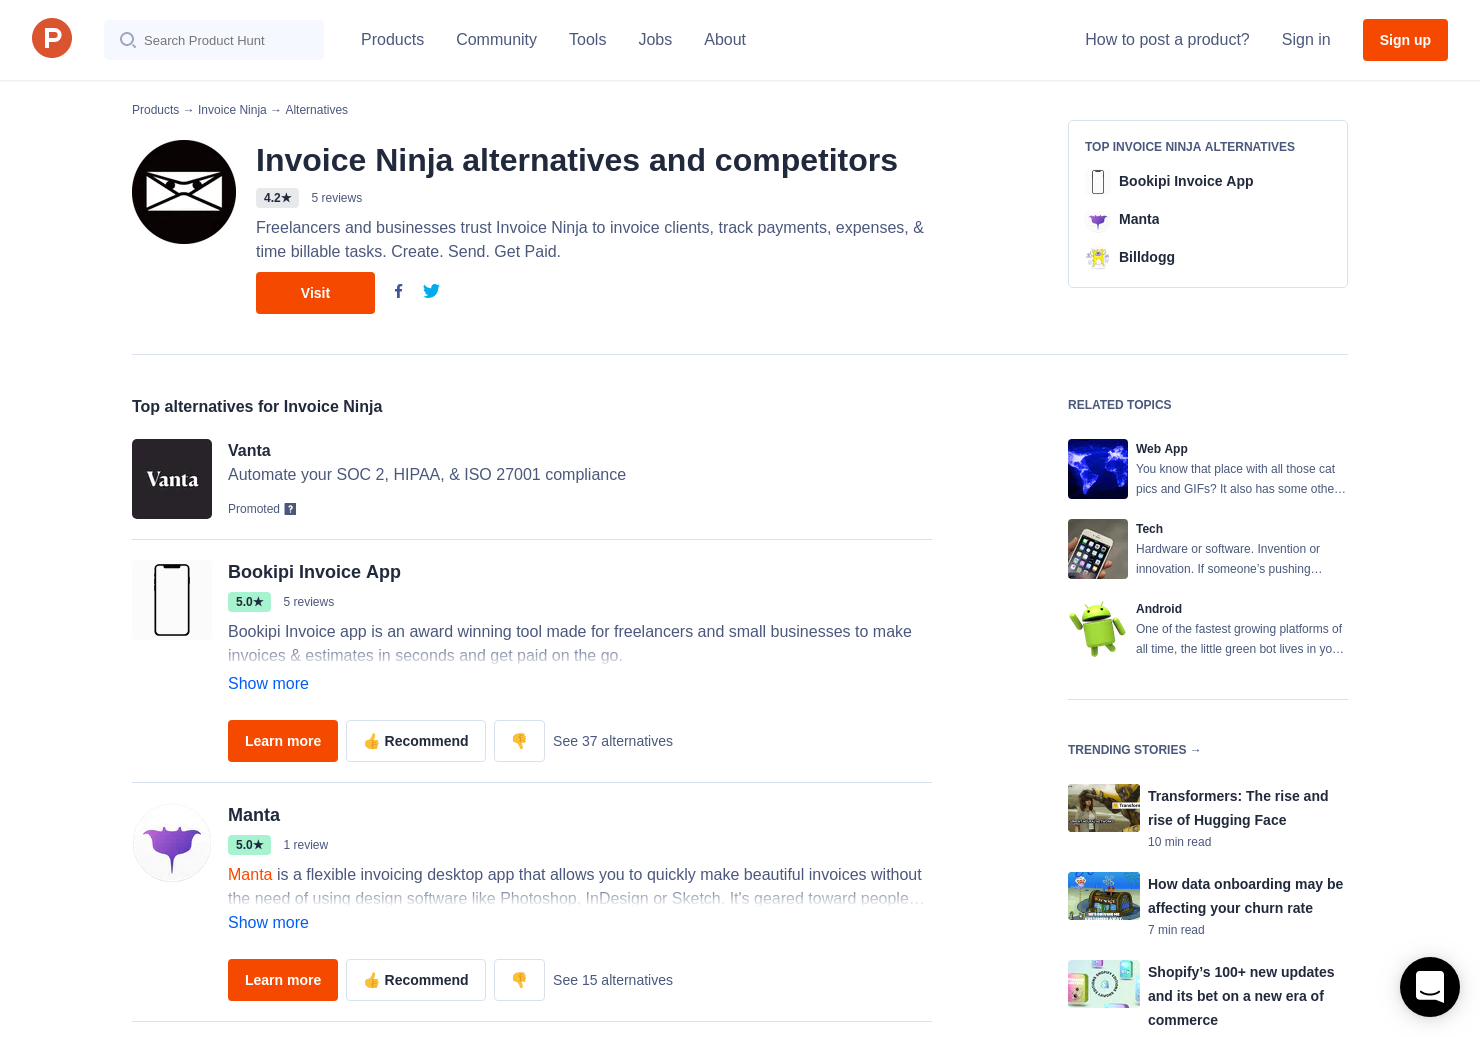 16 Alternatives to Invoice Ninja | Product Hunt